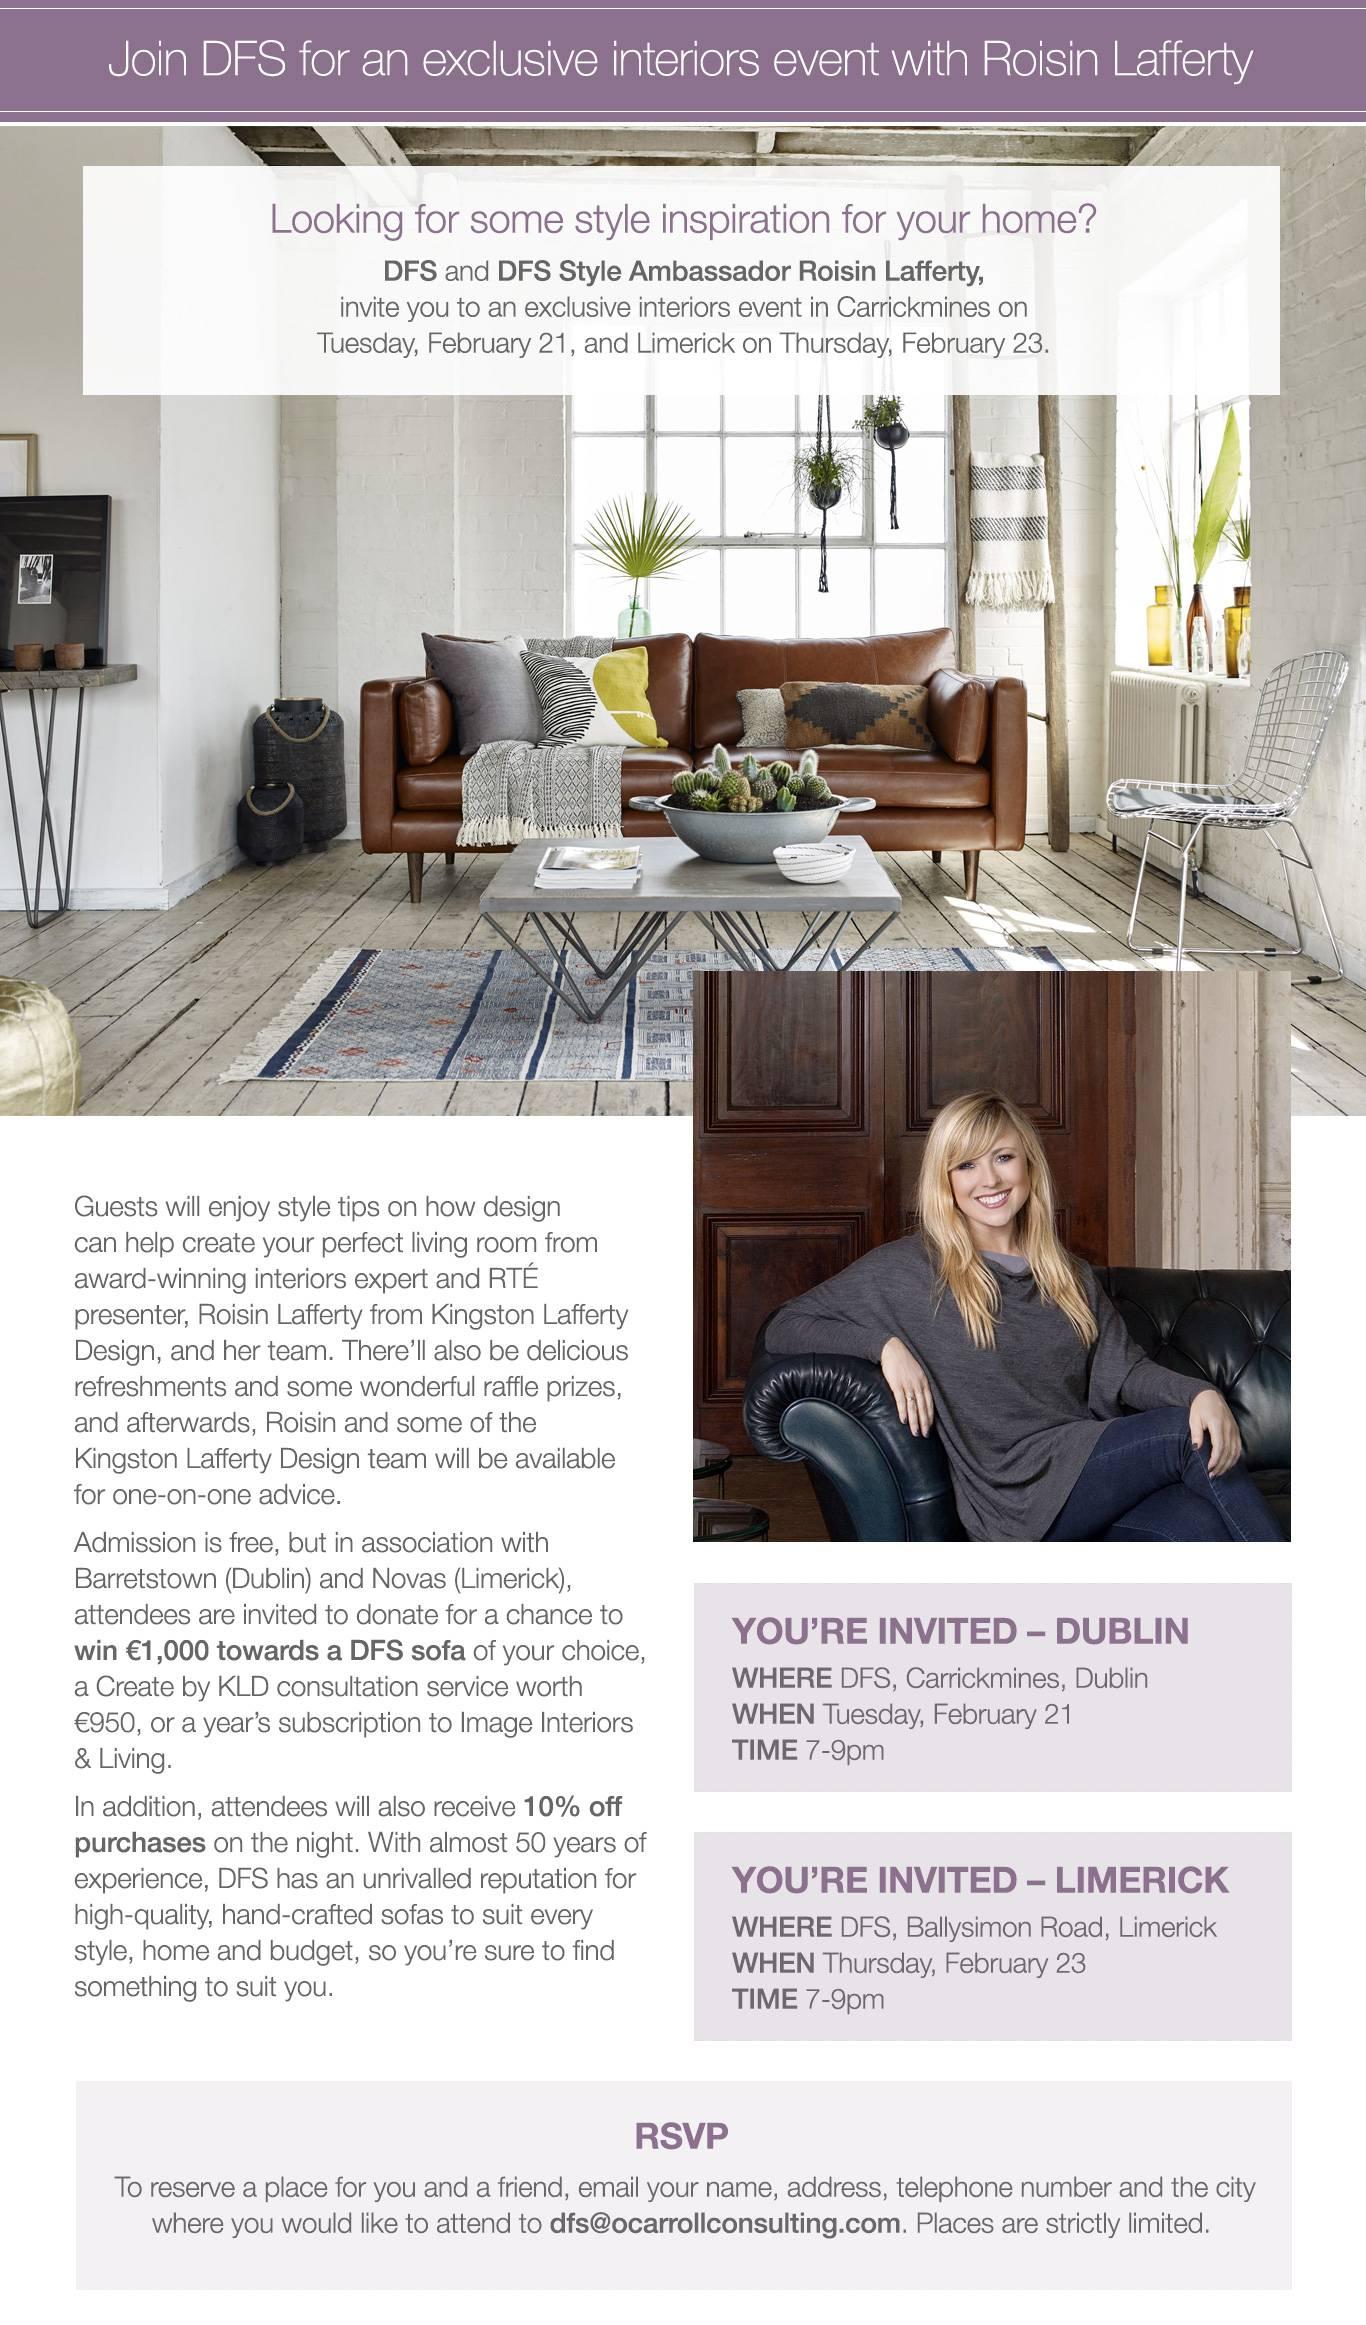 DFS Style Ambassador Roisin Lafferty